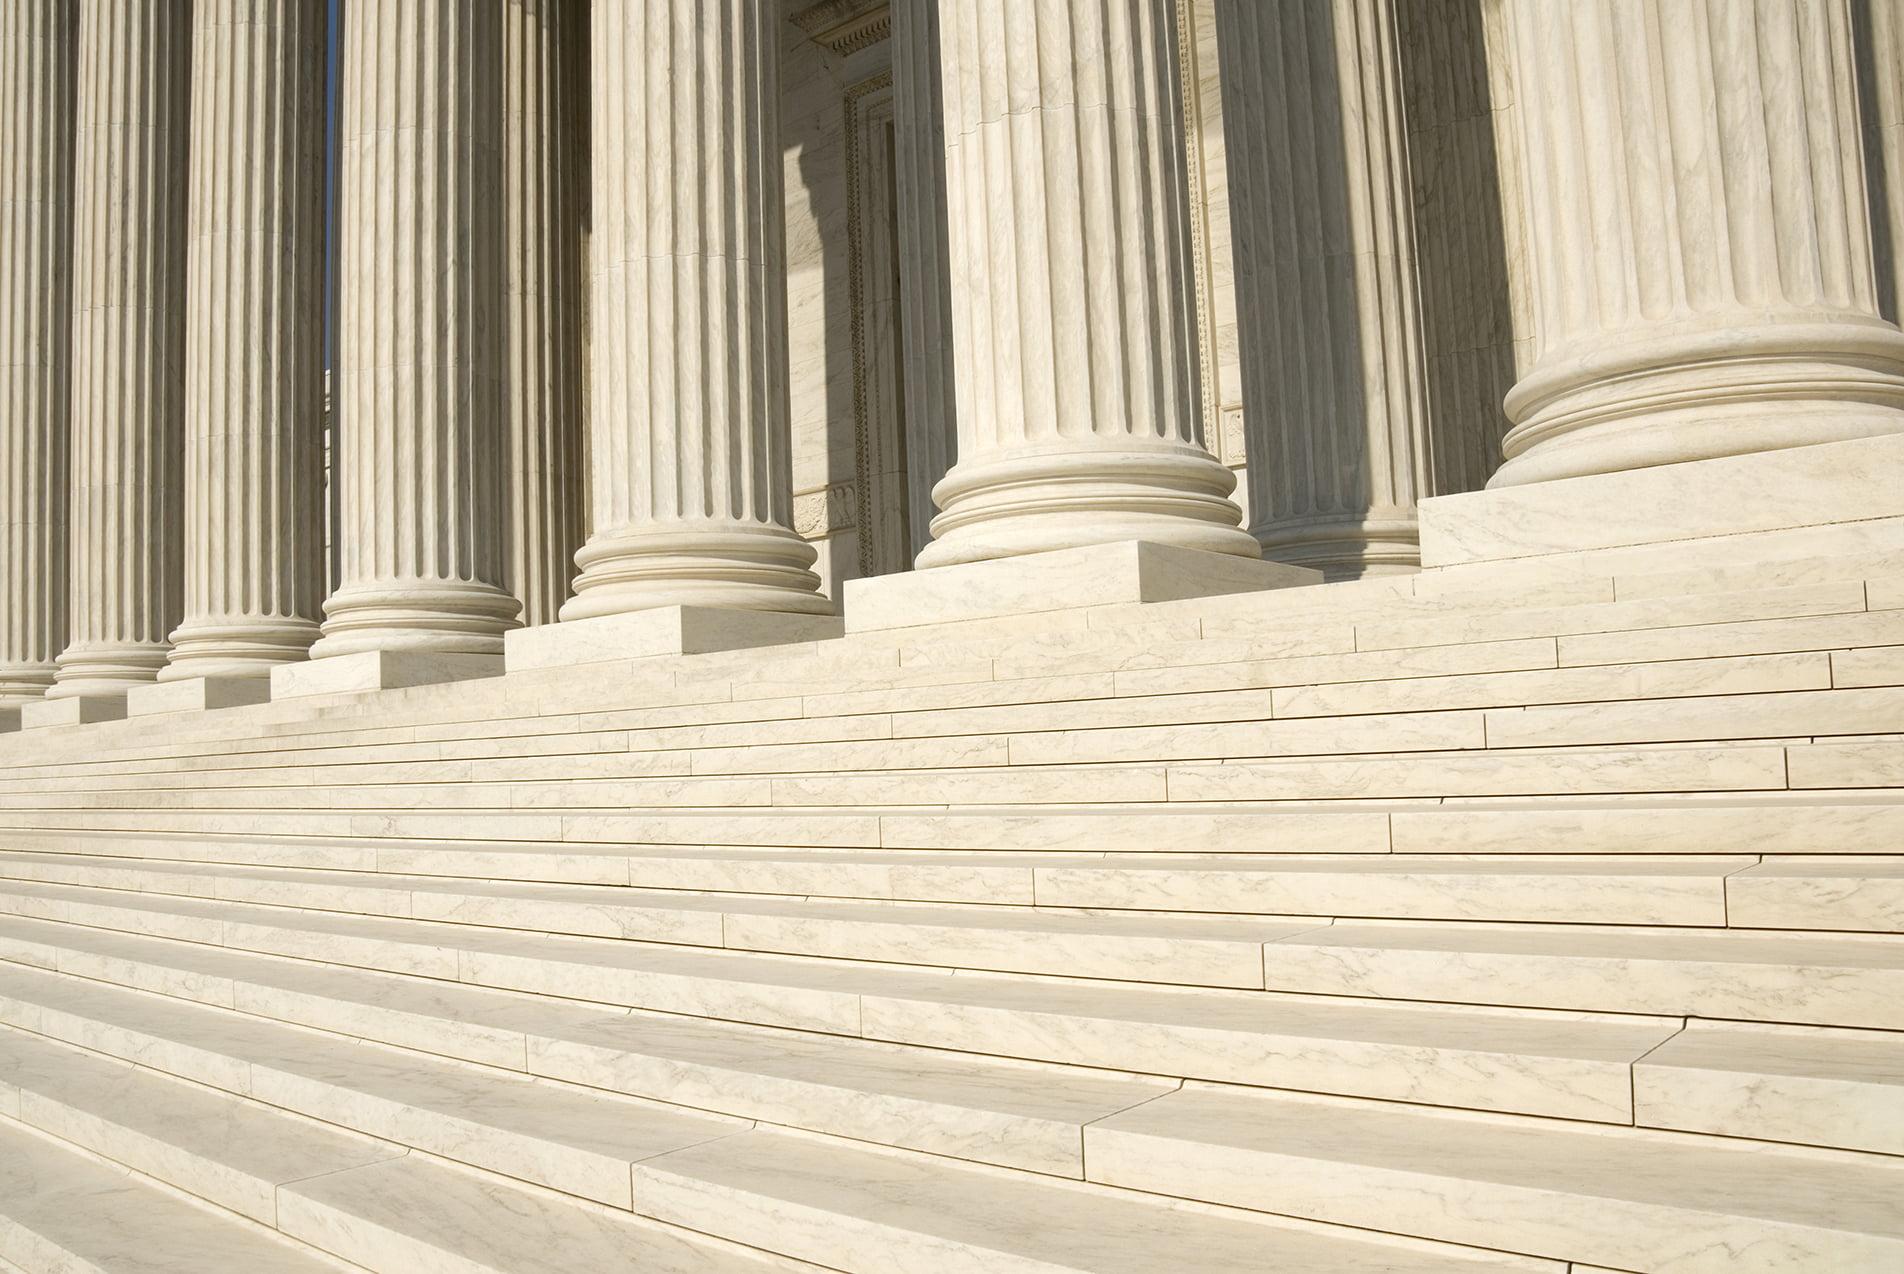 Judicial review of migration decisions